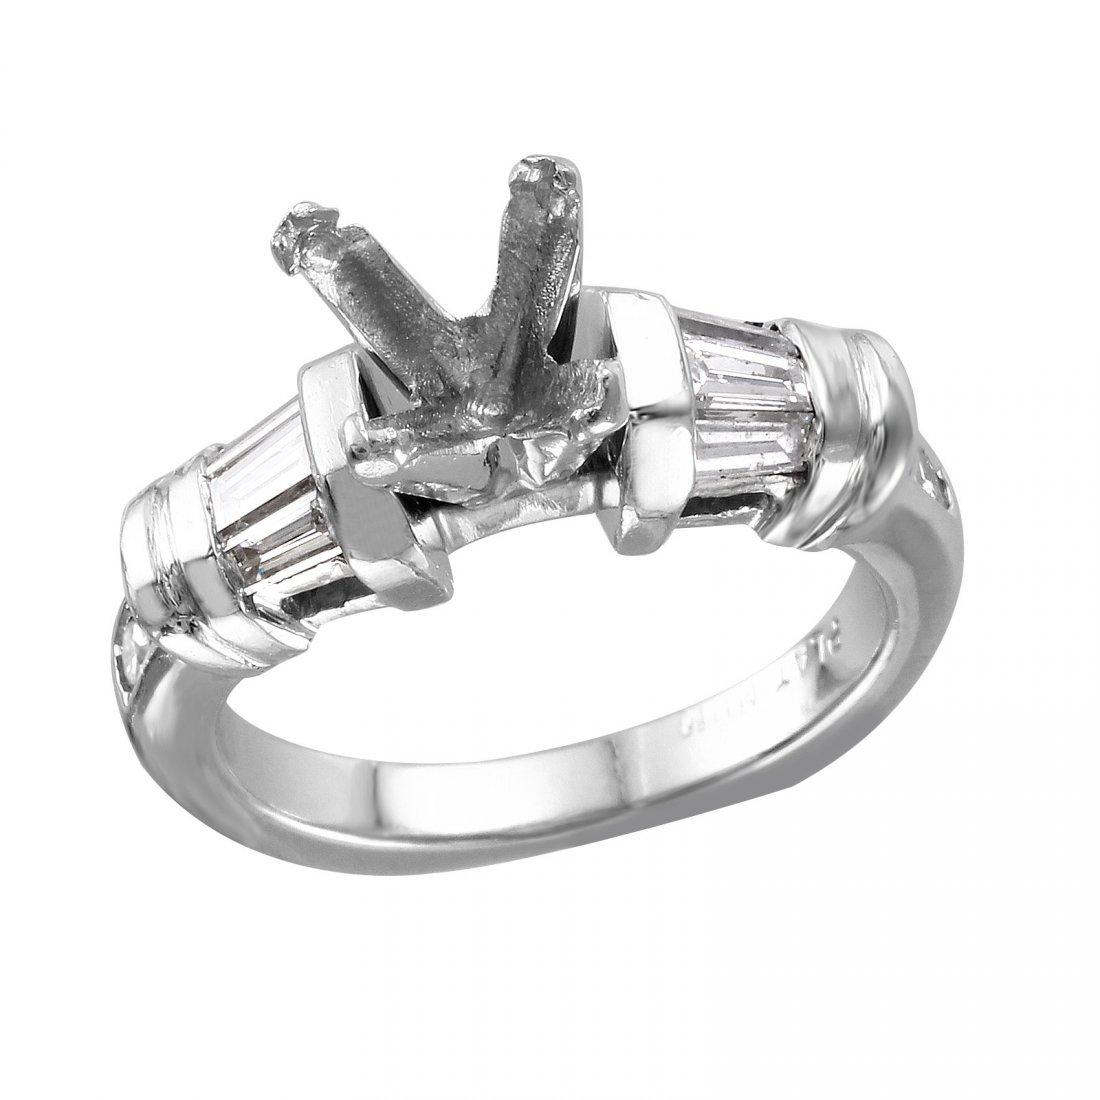 Platinum Semi-Mounting Mixed Diamond Engagement Ring